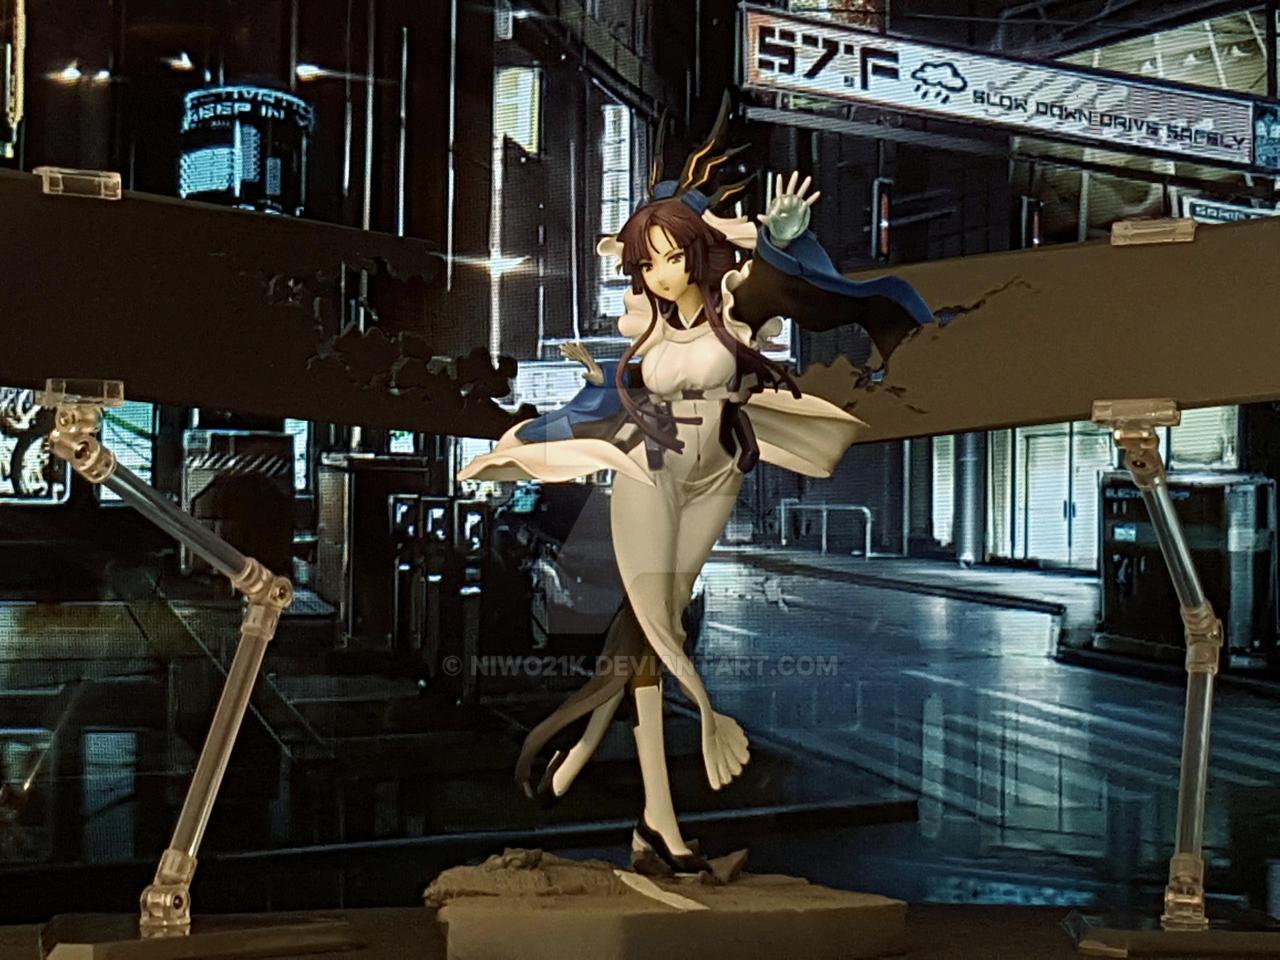 Kazuno attacks! by NiWo21k